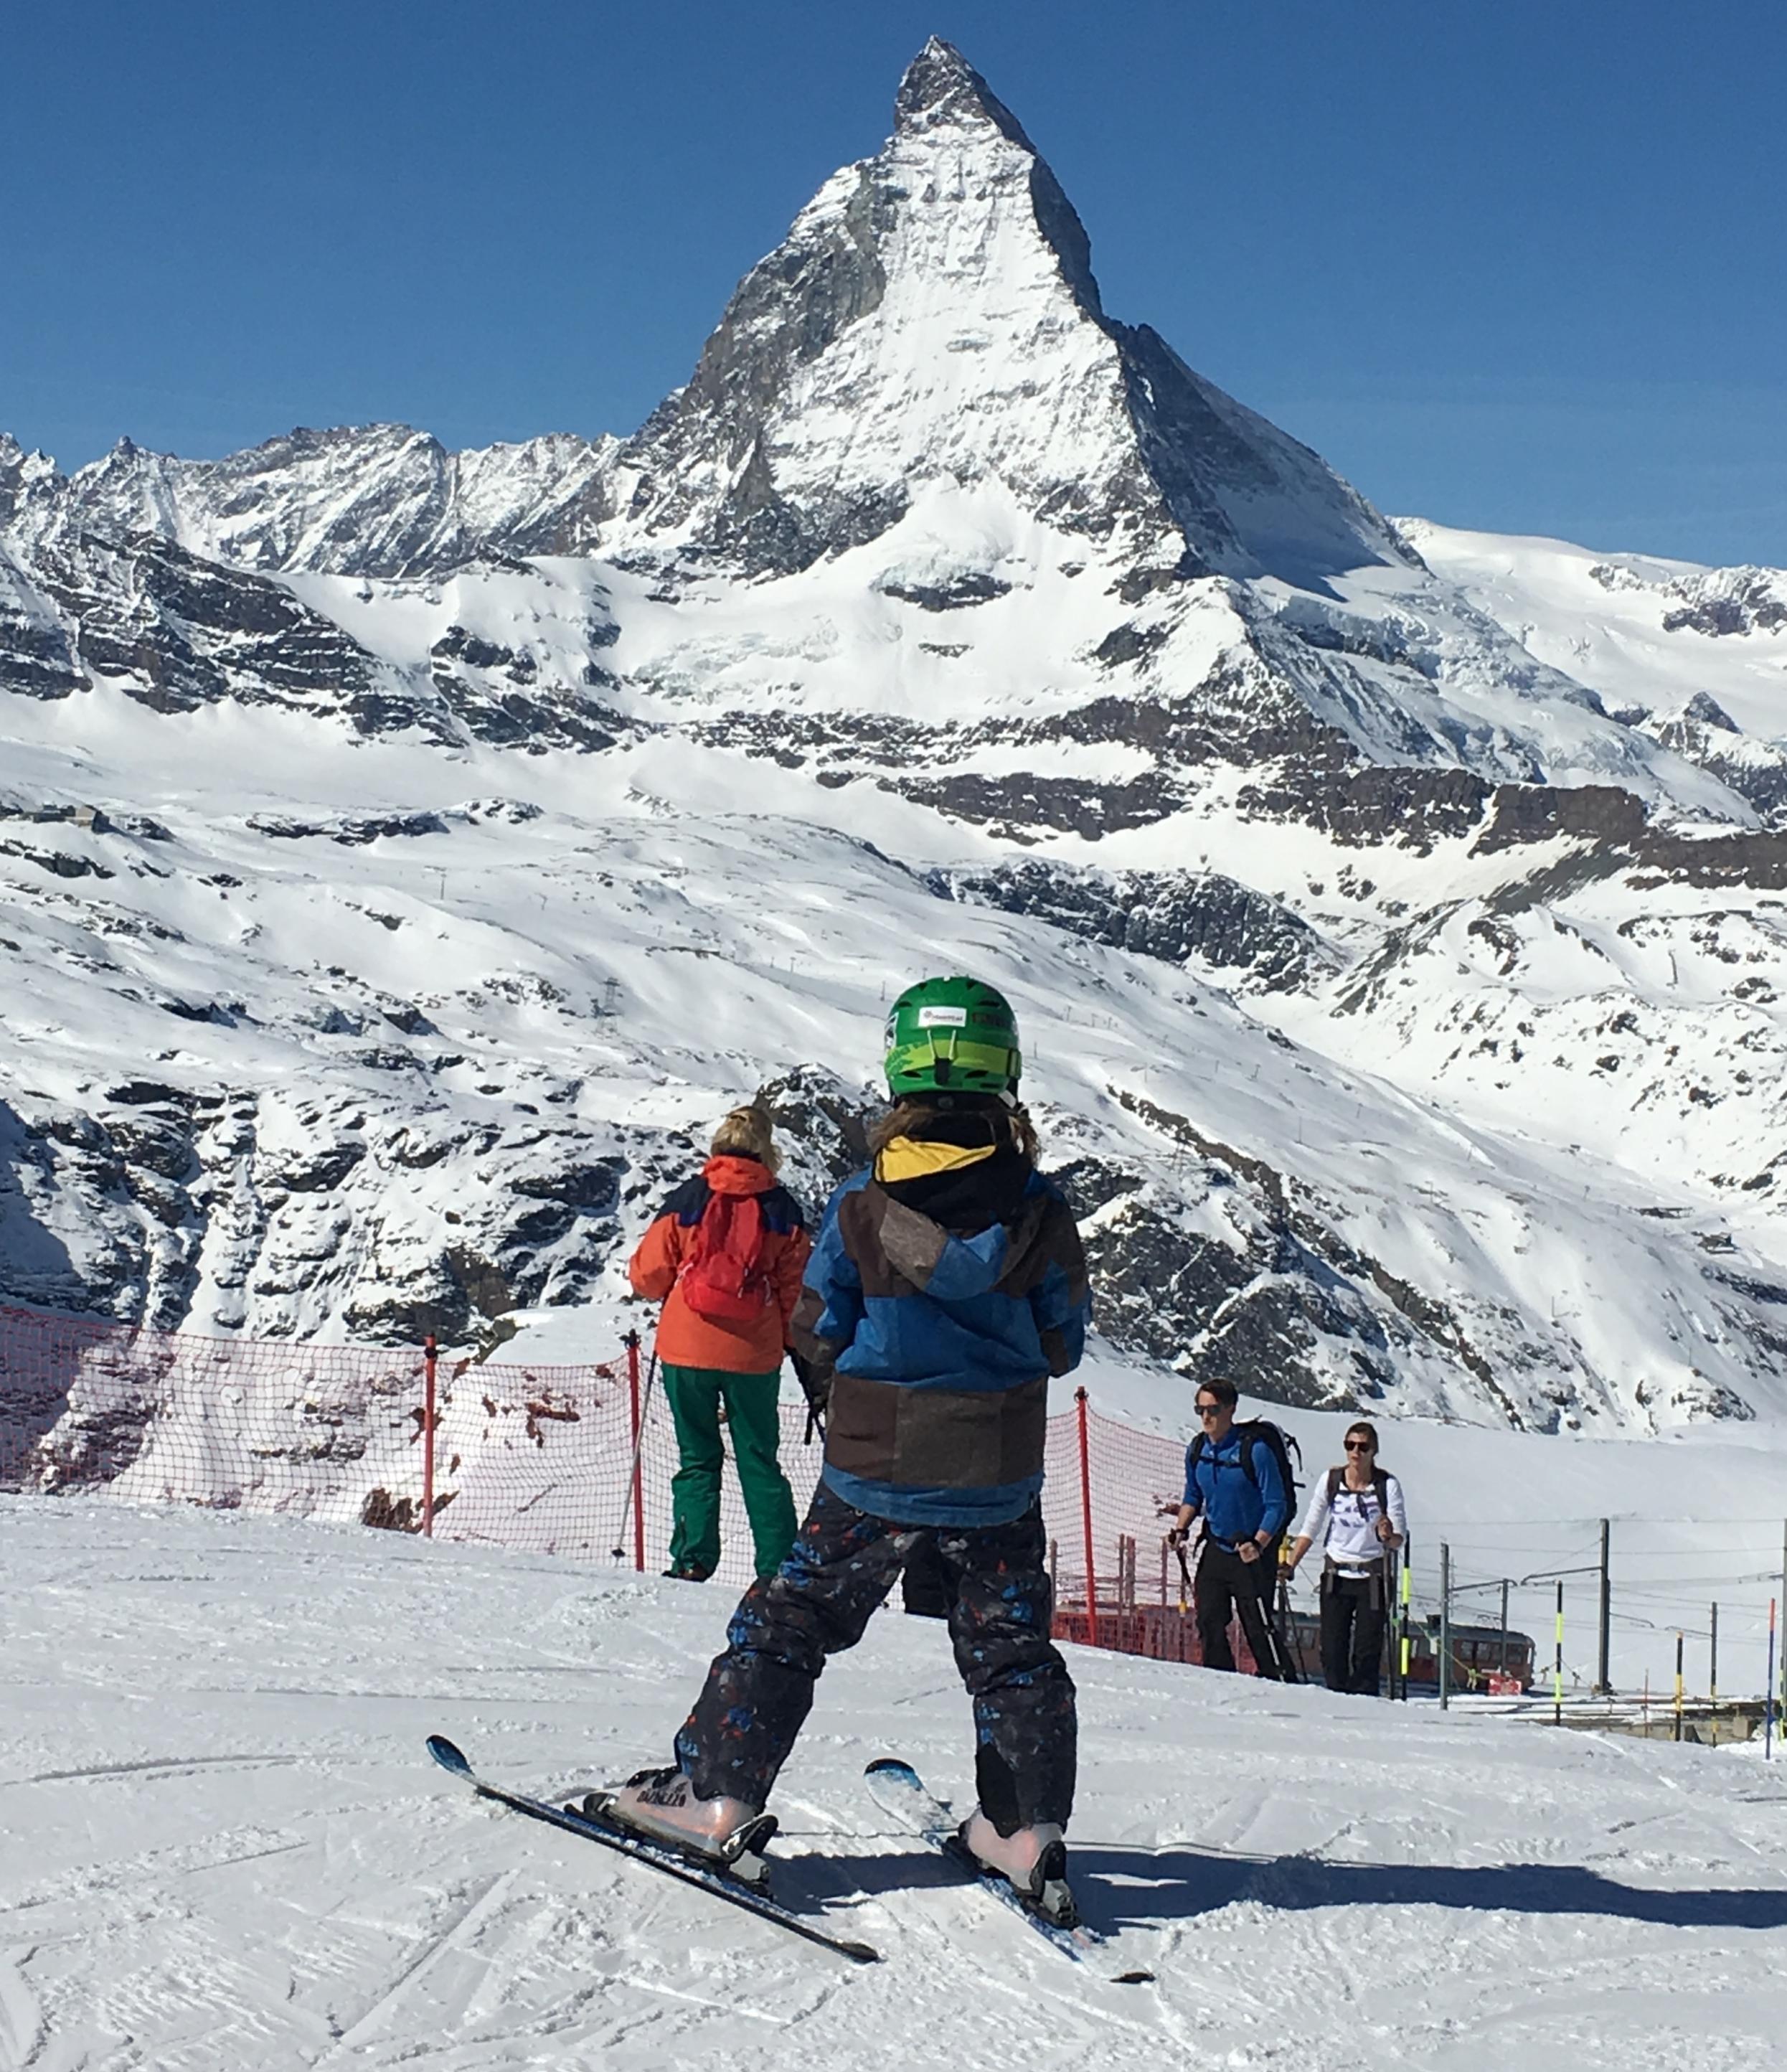 Mi hijo listo para bajar esquiando la pista Gornergrat. Foto: Bruny Nieves